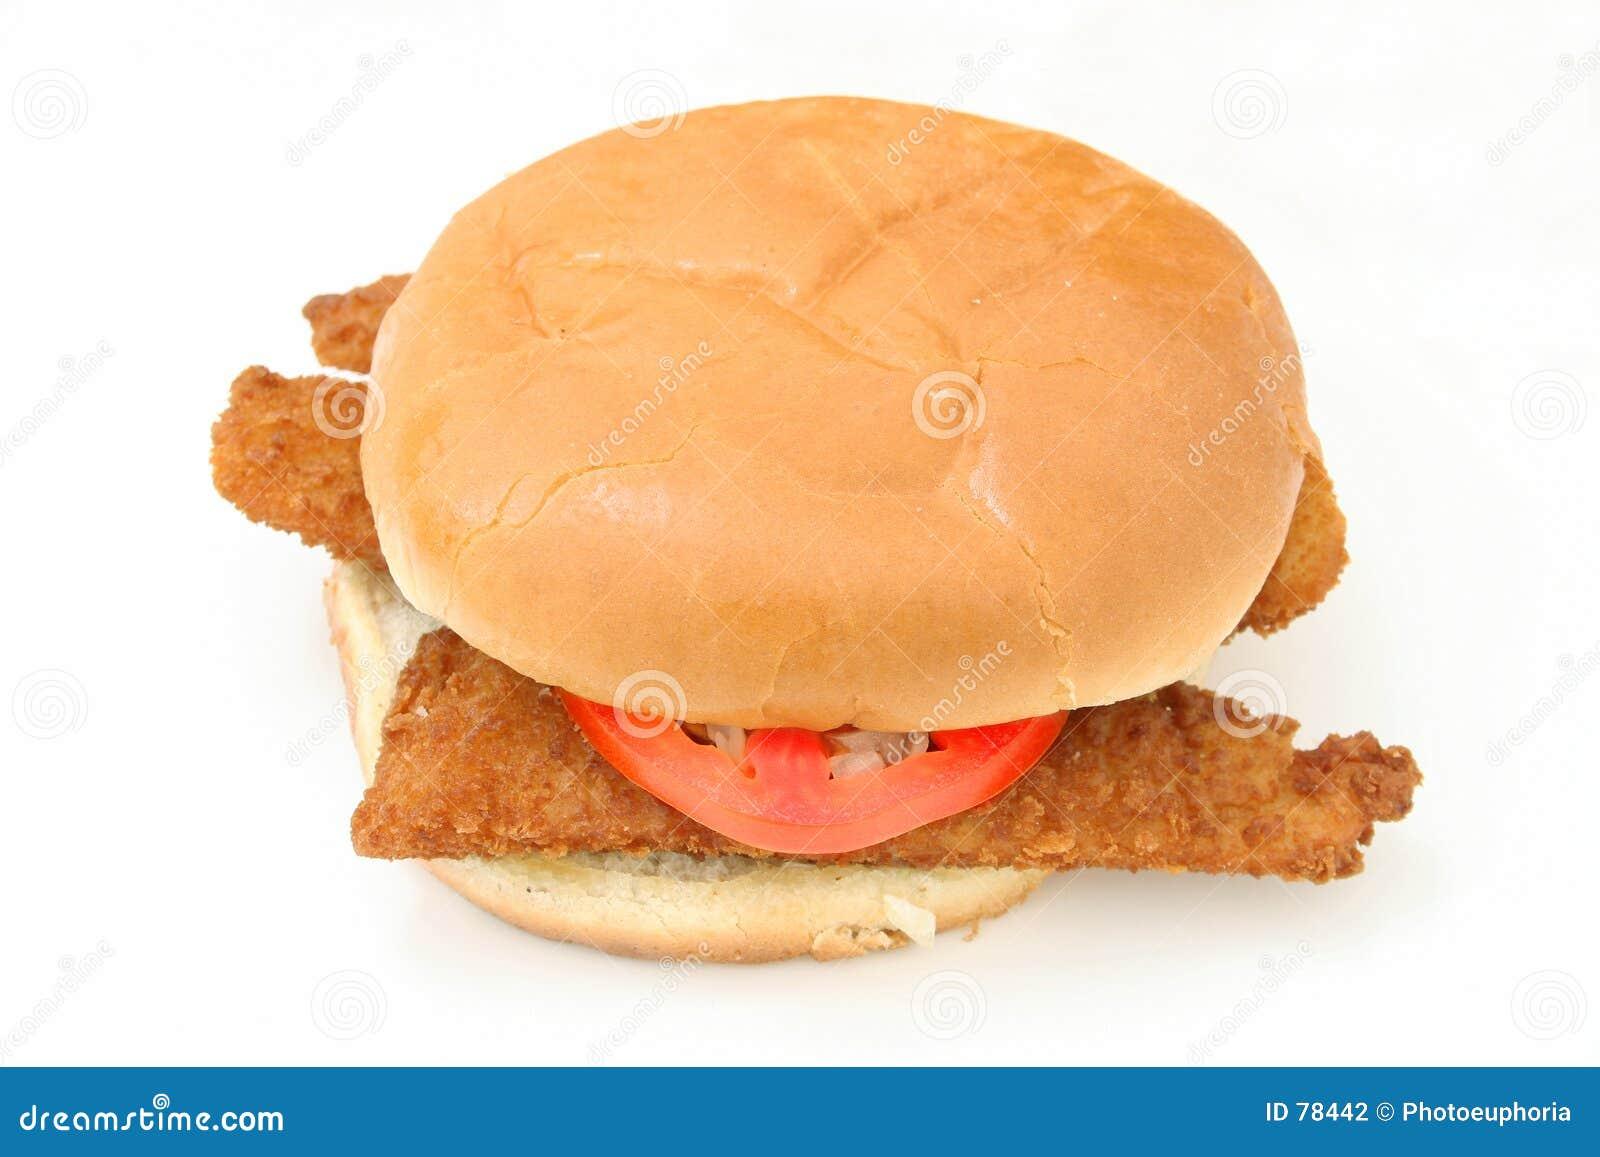 Smażone ryby poszatkowany chrupiące kanapki cebulkowy pomidor